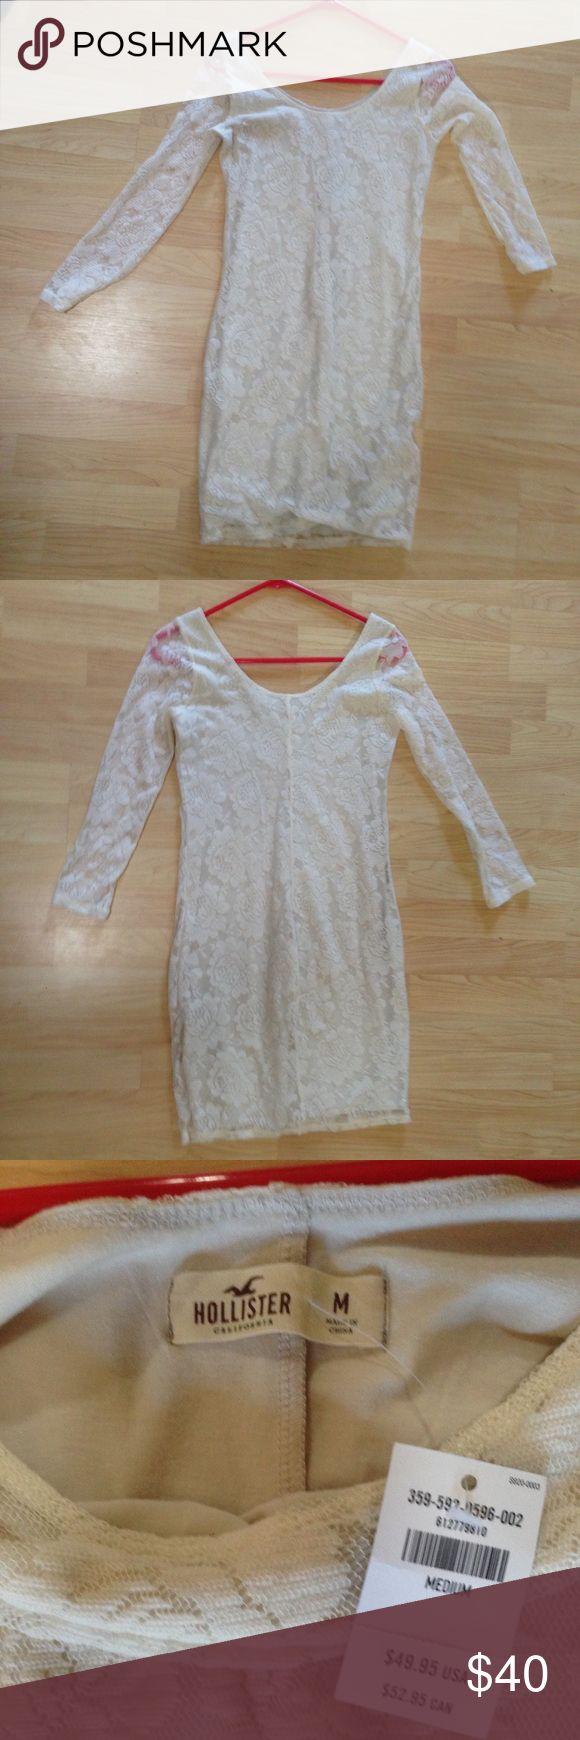 Long sleeve lace white hollister dress Brand new white long sleeve lace hollister dress that was too long for me I'm 5'2. Hollister Dresses Long Sleeve